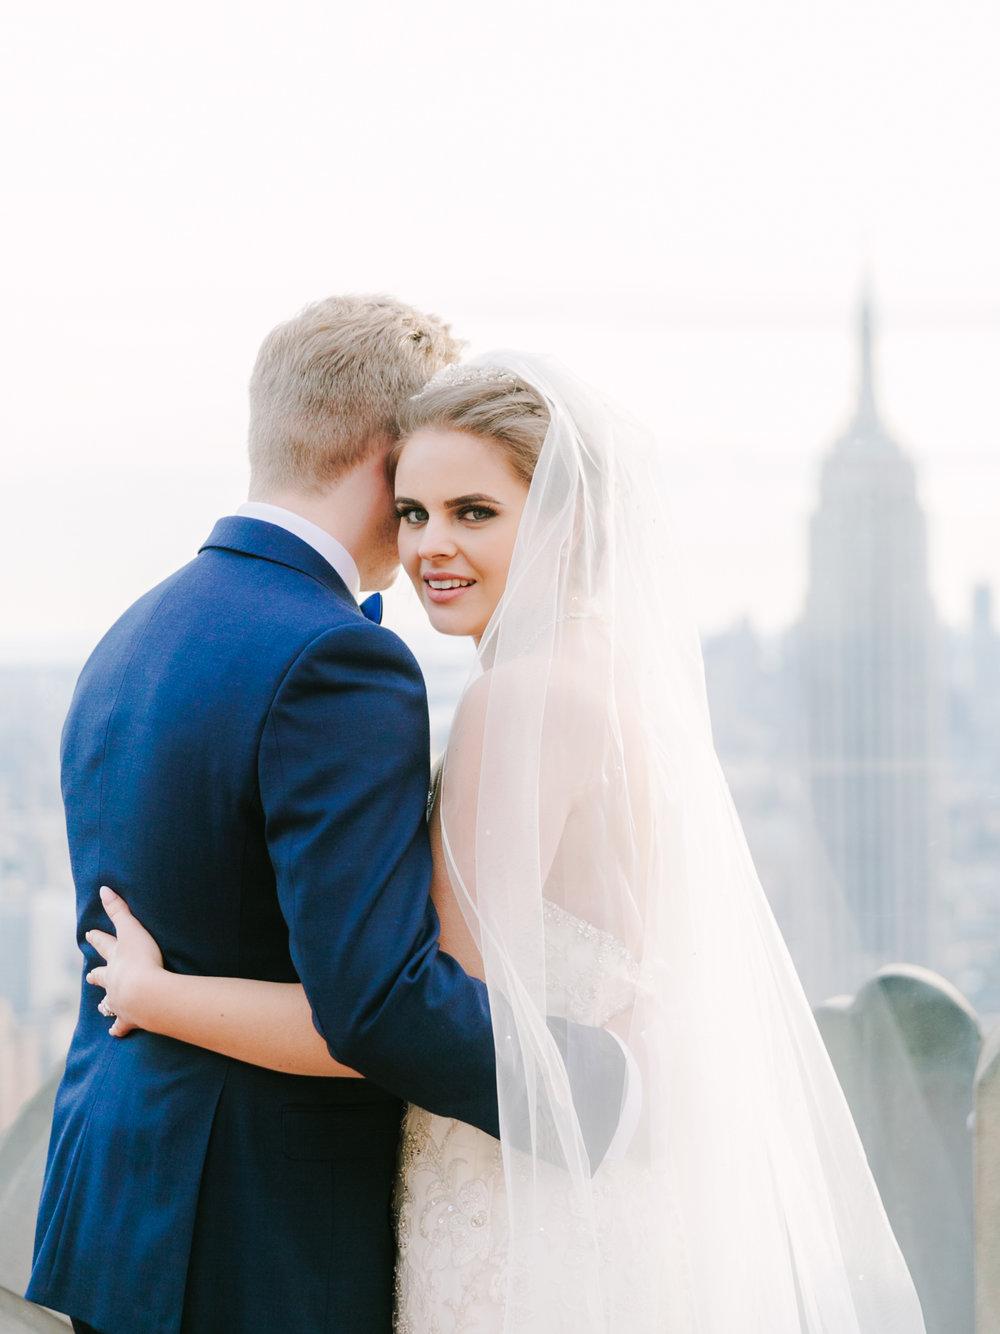 NYC-wedding-photography-by-Tanya-Isaeva-cover-3.jpg